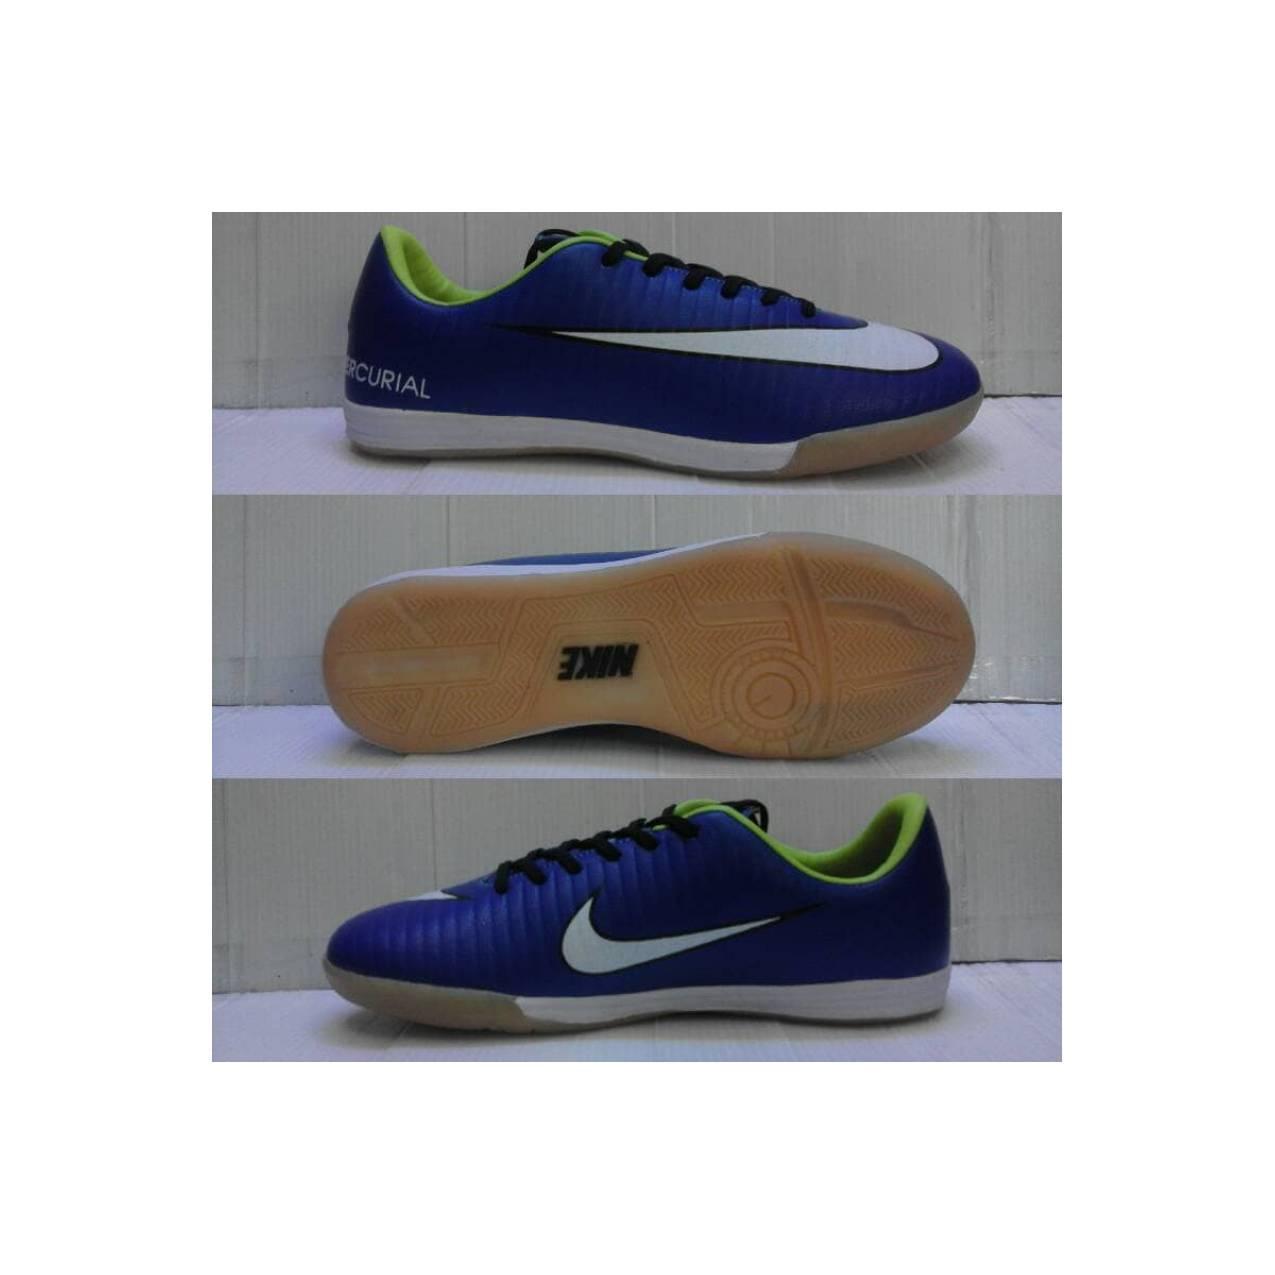 sepatu futsal nike mercurial VI biru list putih sol karet